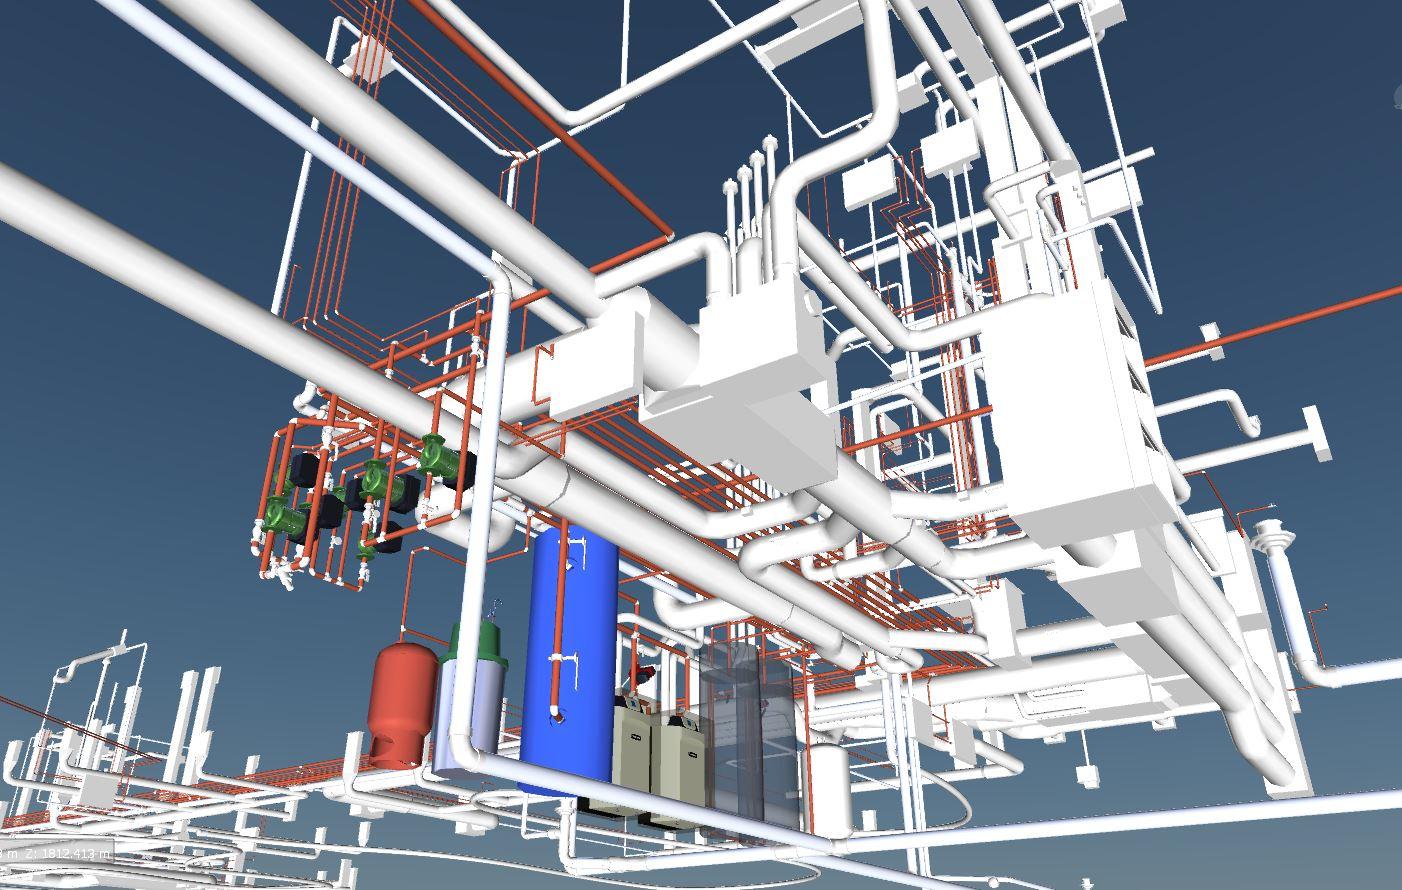 JM Engineering luxury home ketchum Idaho HVAC system